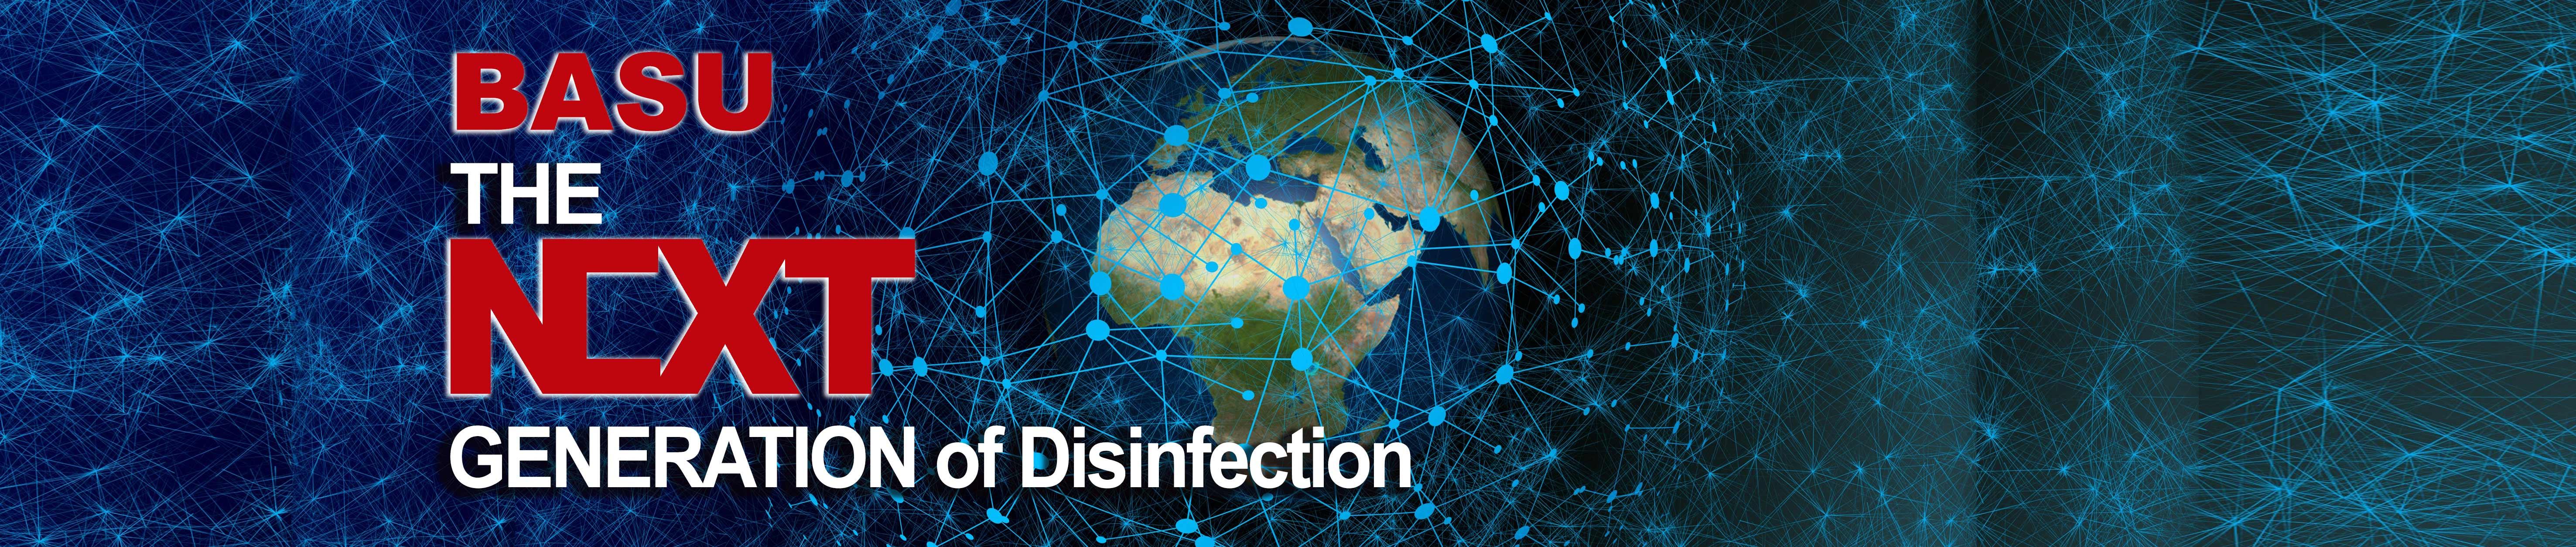 Basu desinfections